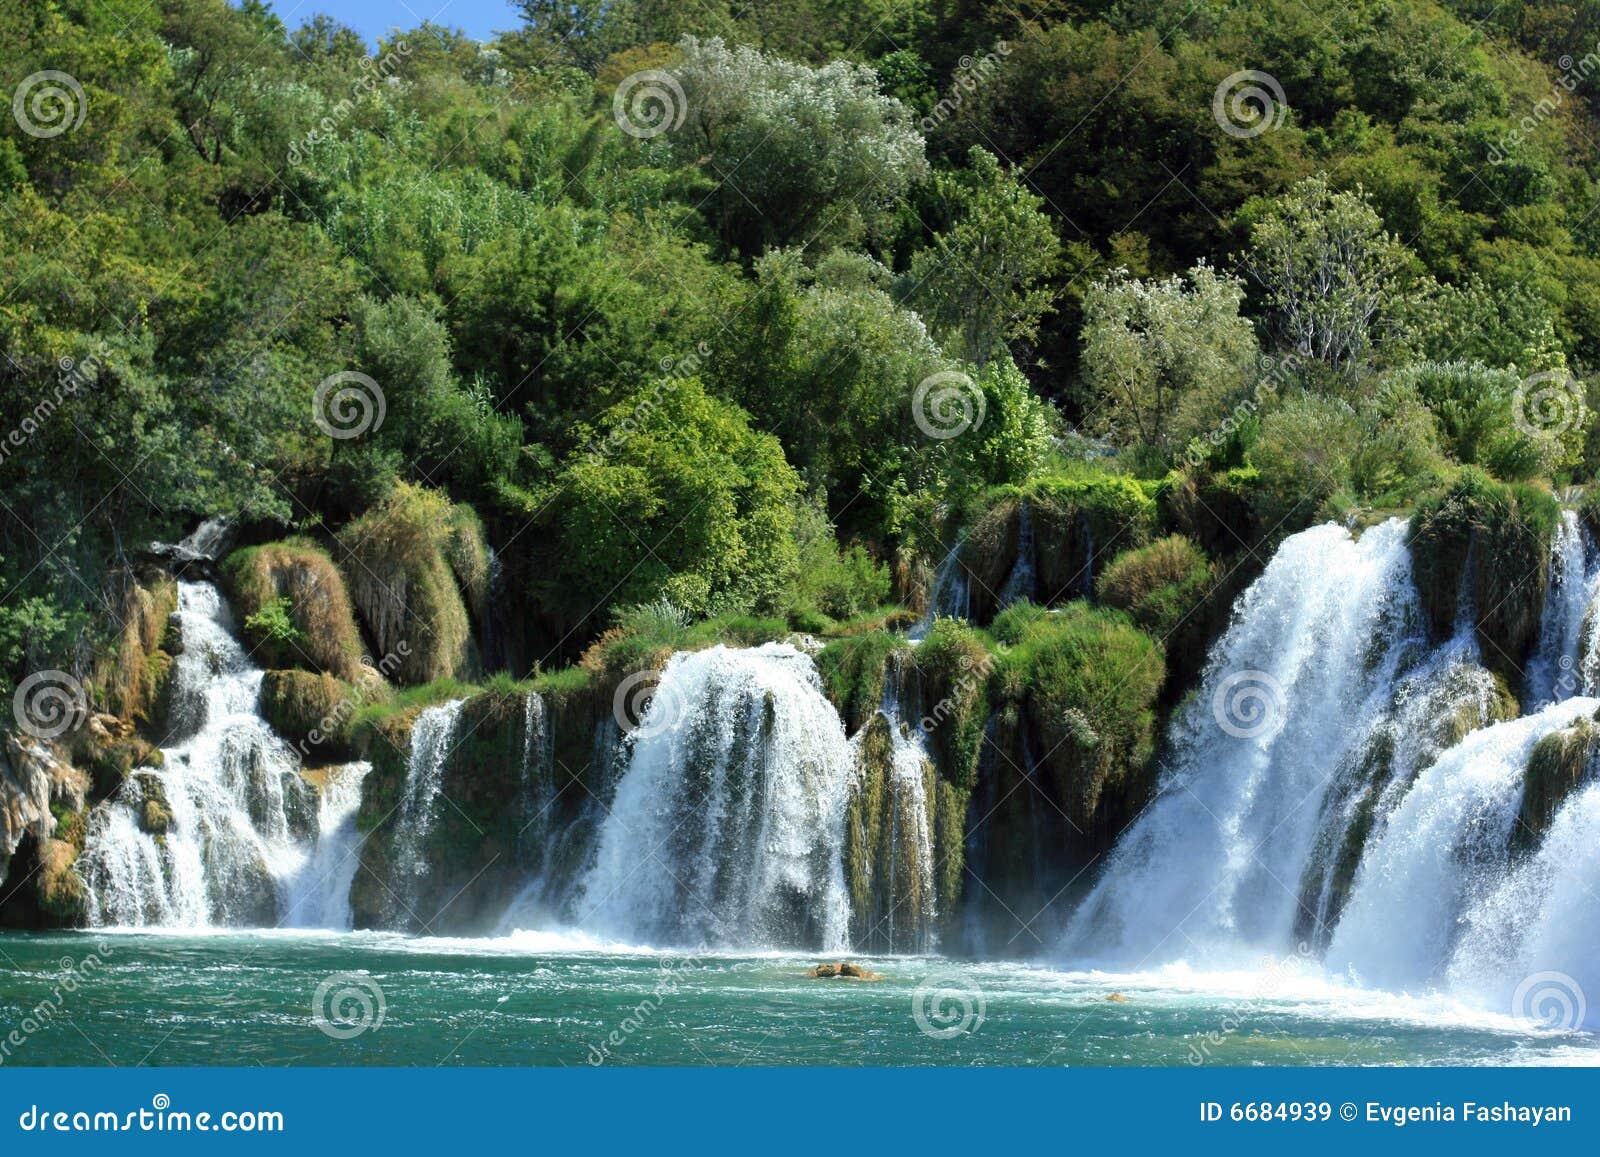 The river Krka